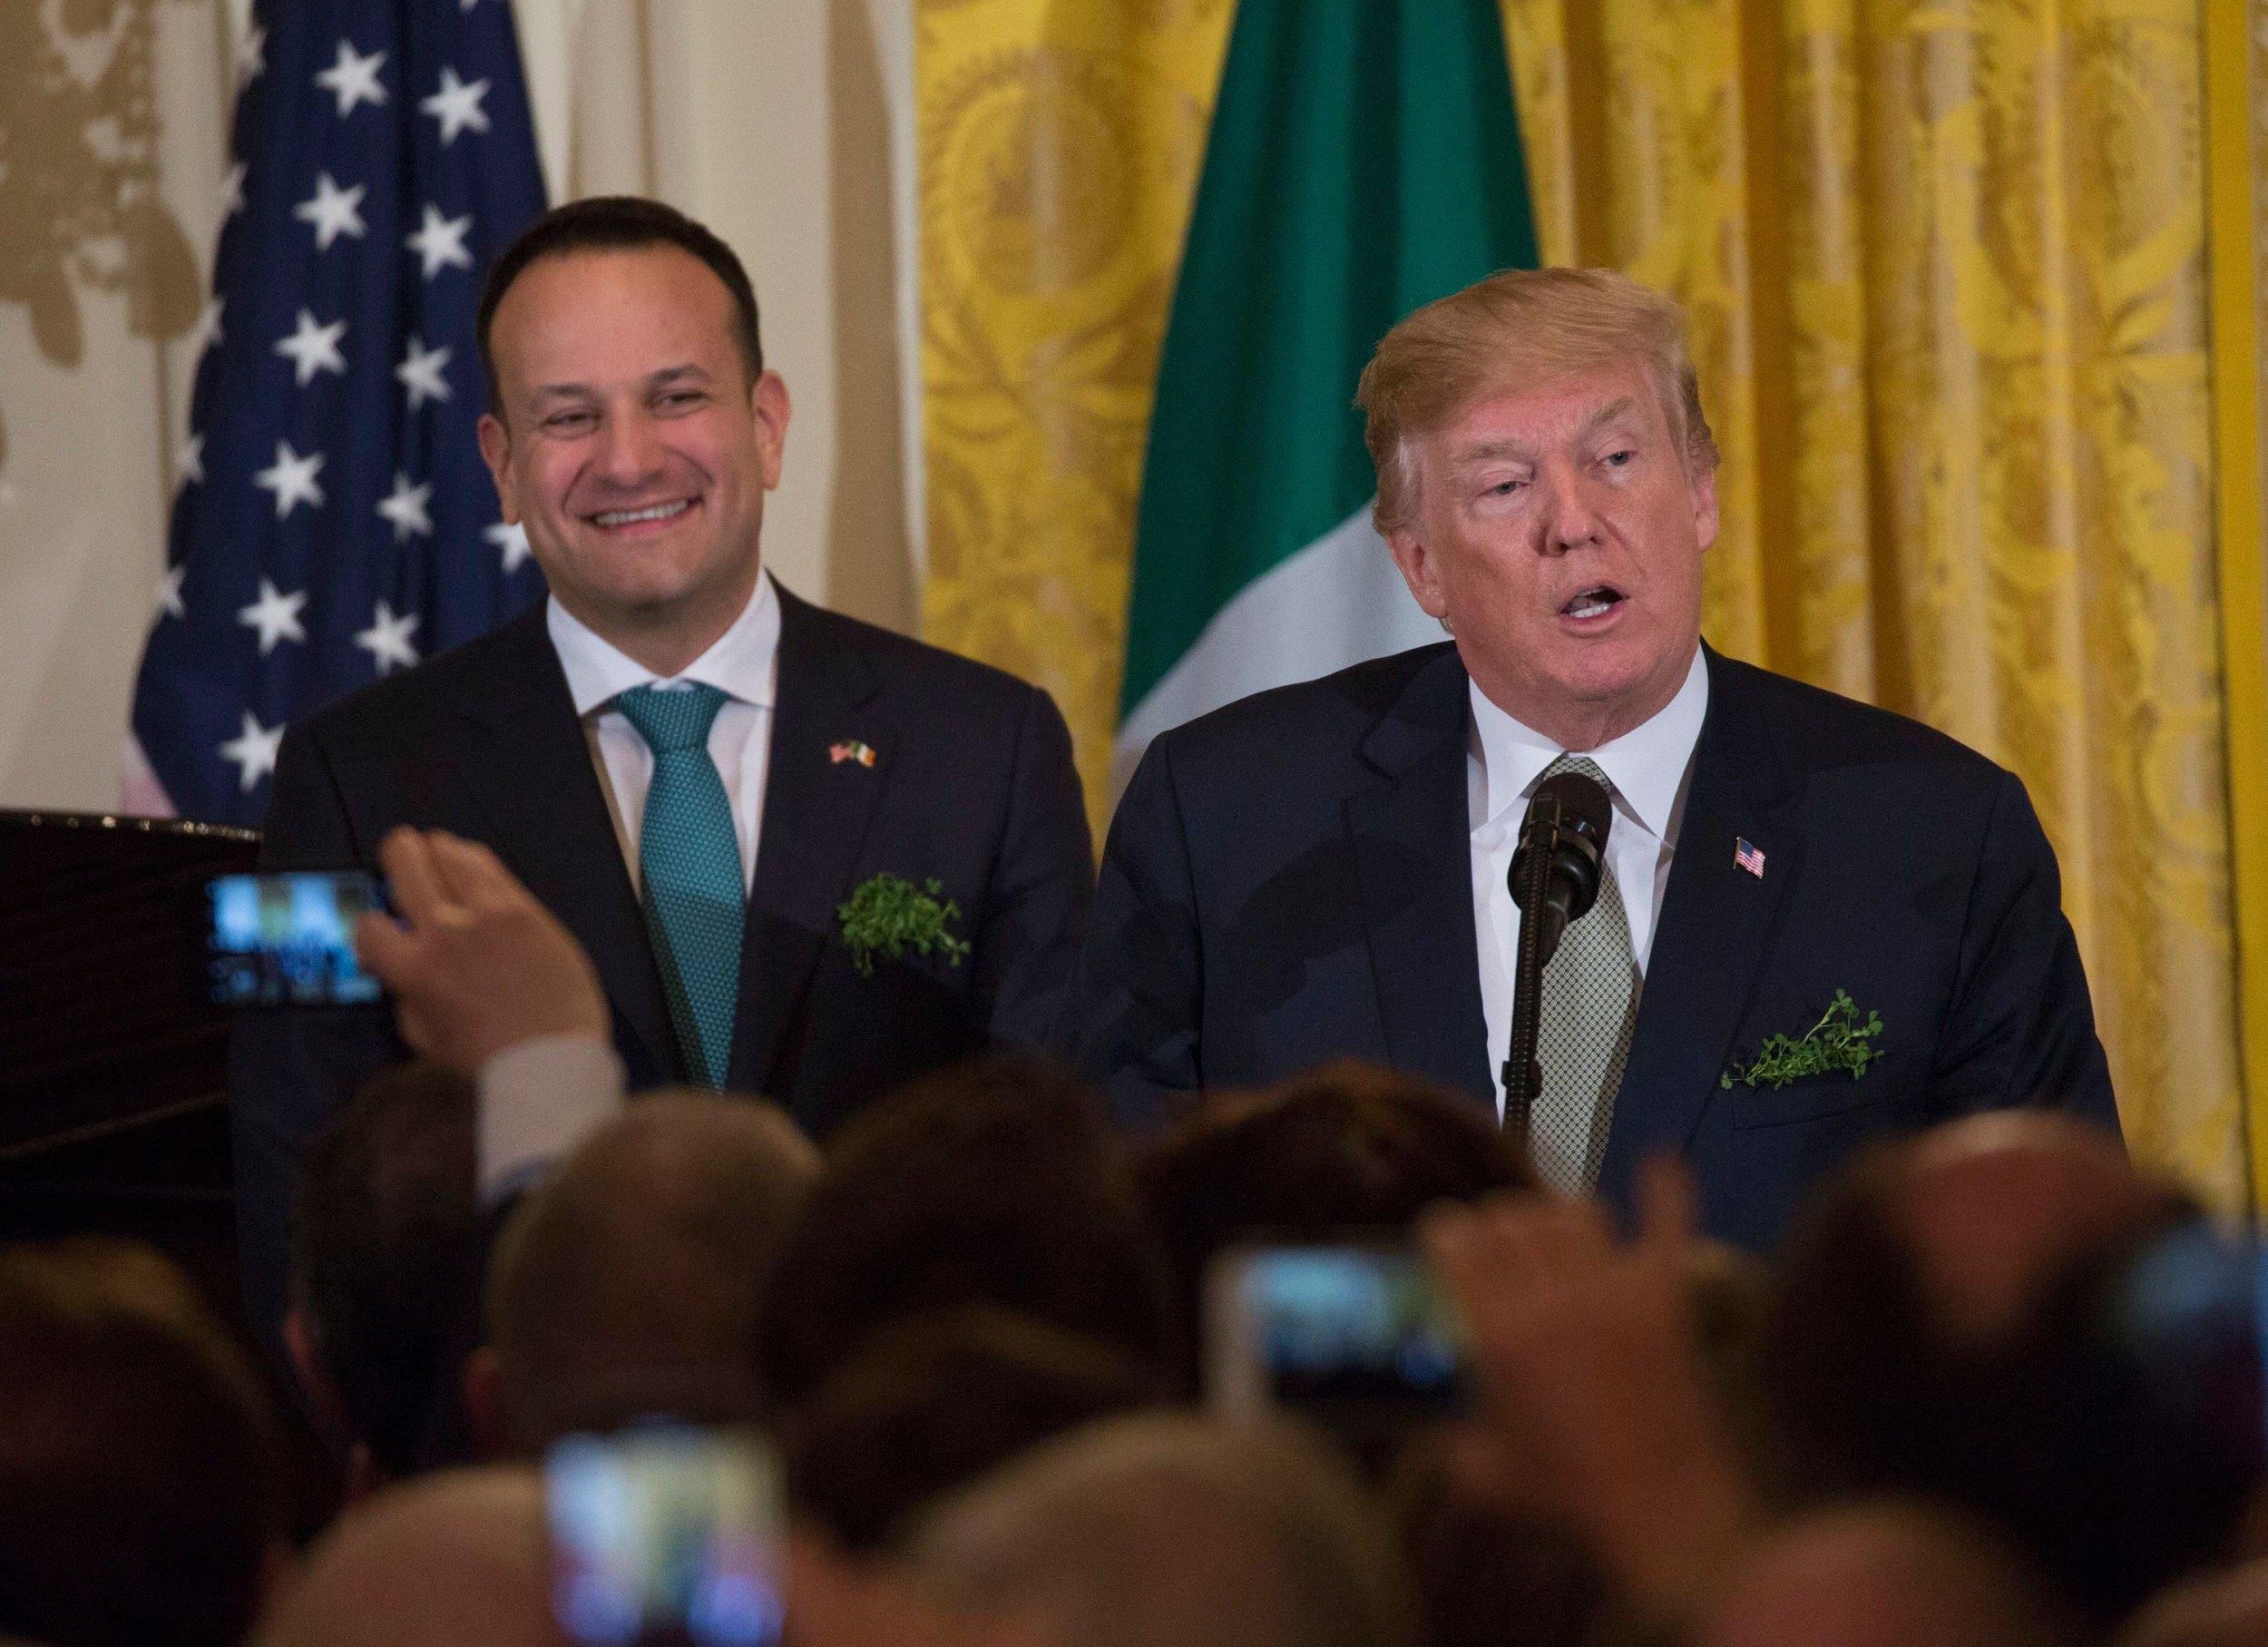 Donald Trump to visit Ireland in November